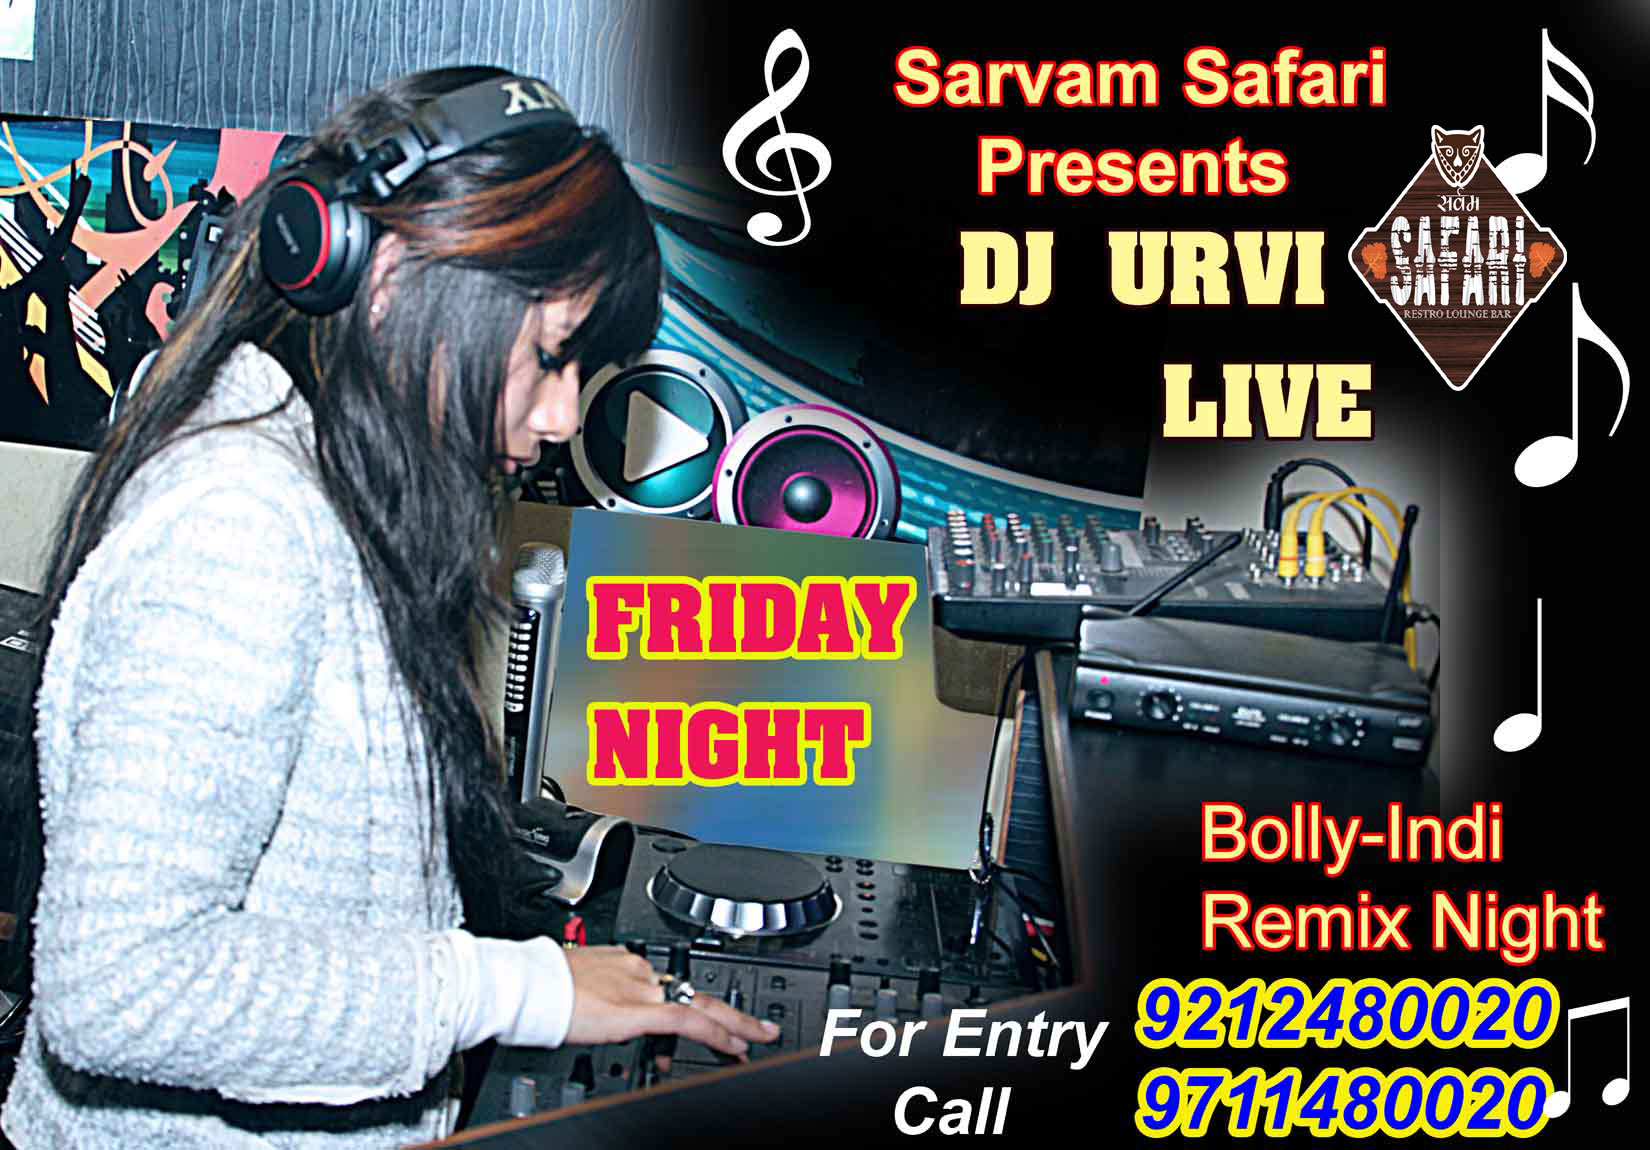 Bolly-Indi Remix Nite with DJ URVI Live Performance